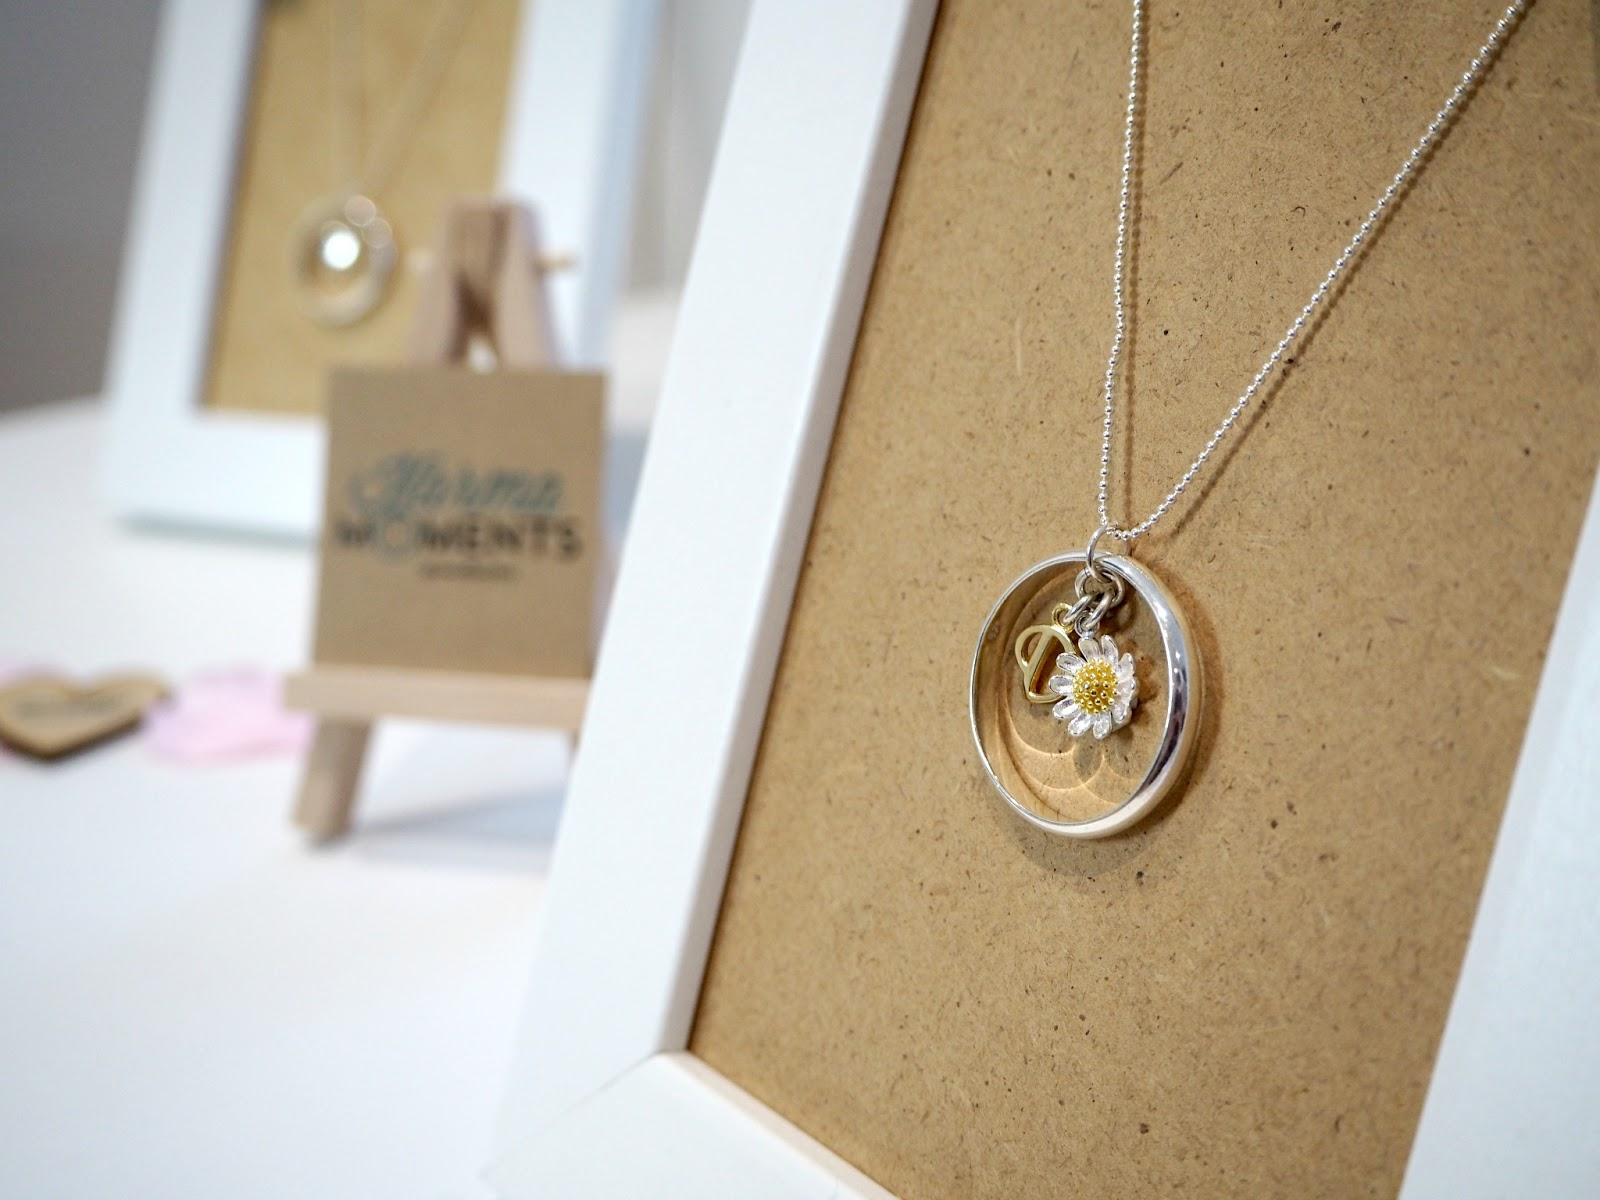 JewelleryBox Karma Moments Necklace with daisy charm